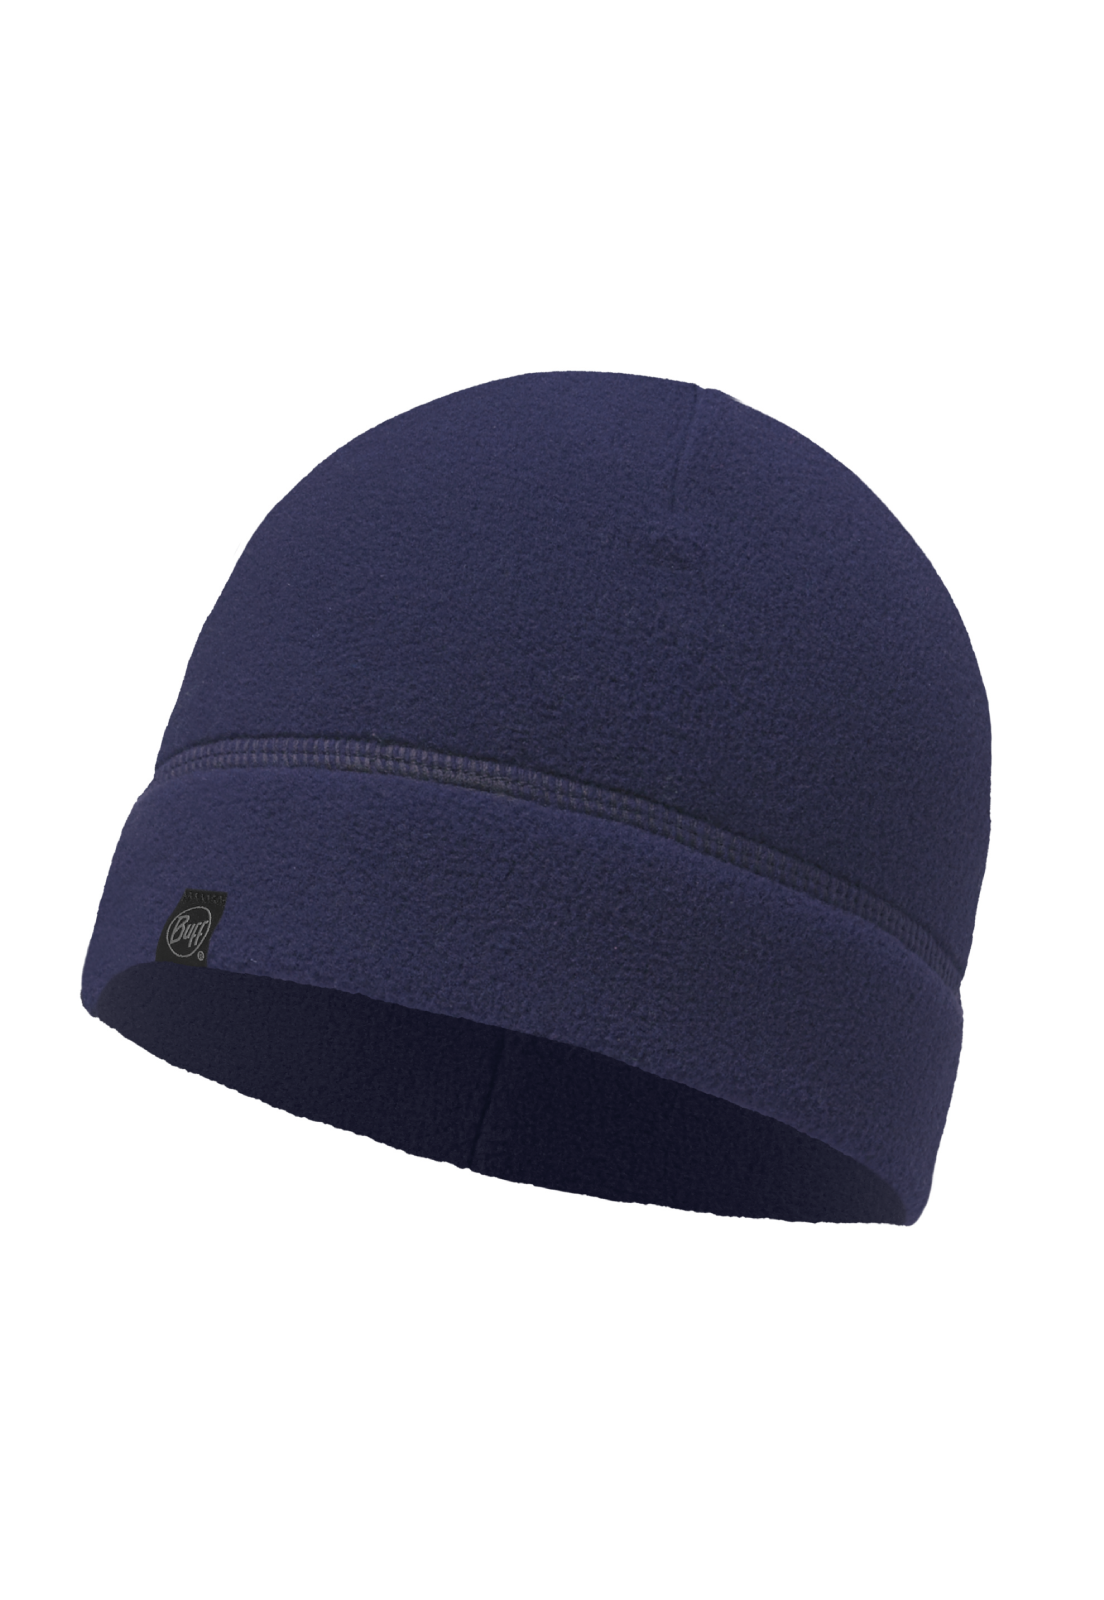 Polar Hat Jr & Child Solid Navy